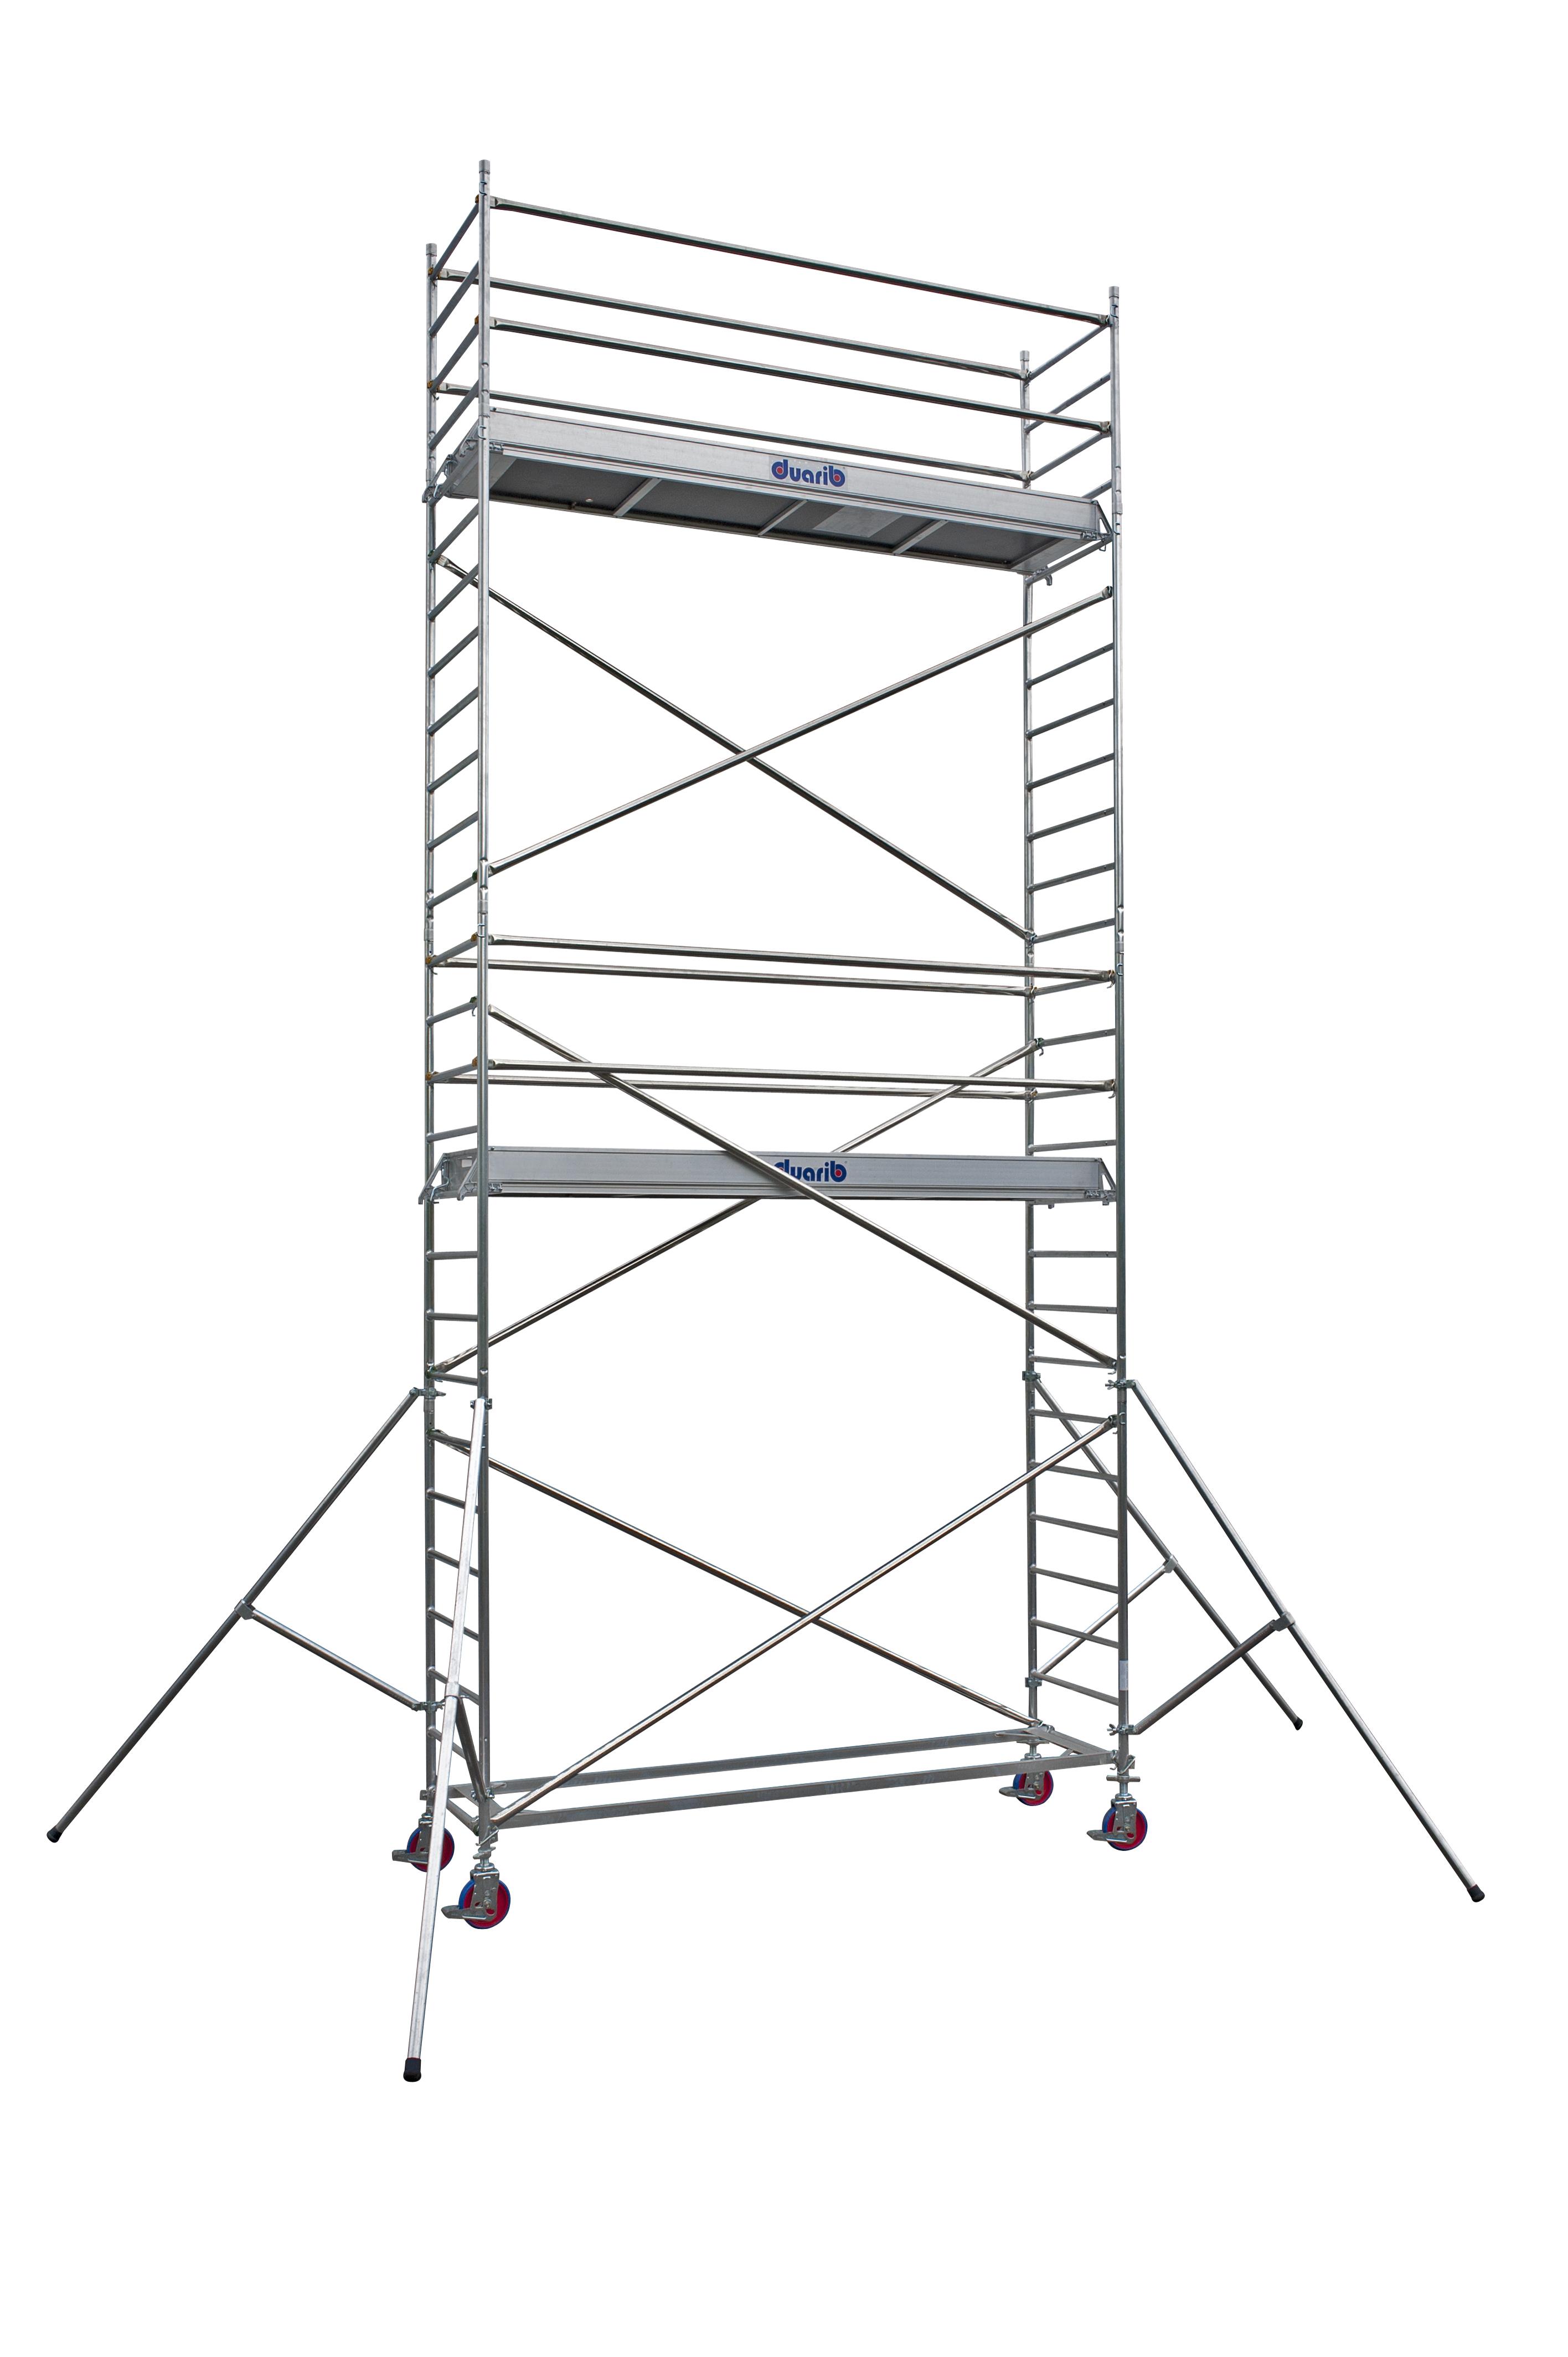 duarib echafaudages roulants aluminium docker2 85 long. Black Bedroom Furniture Sets. Home Design Ideas